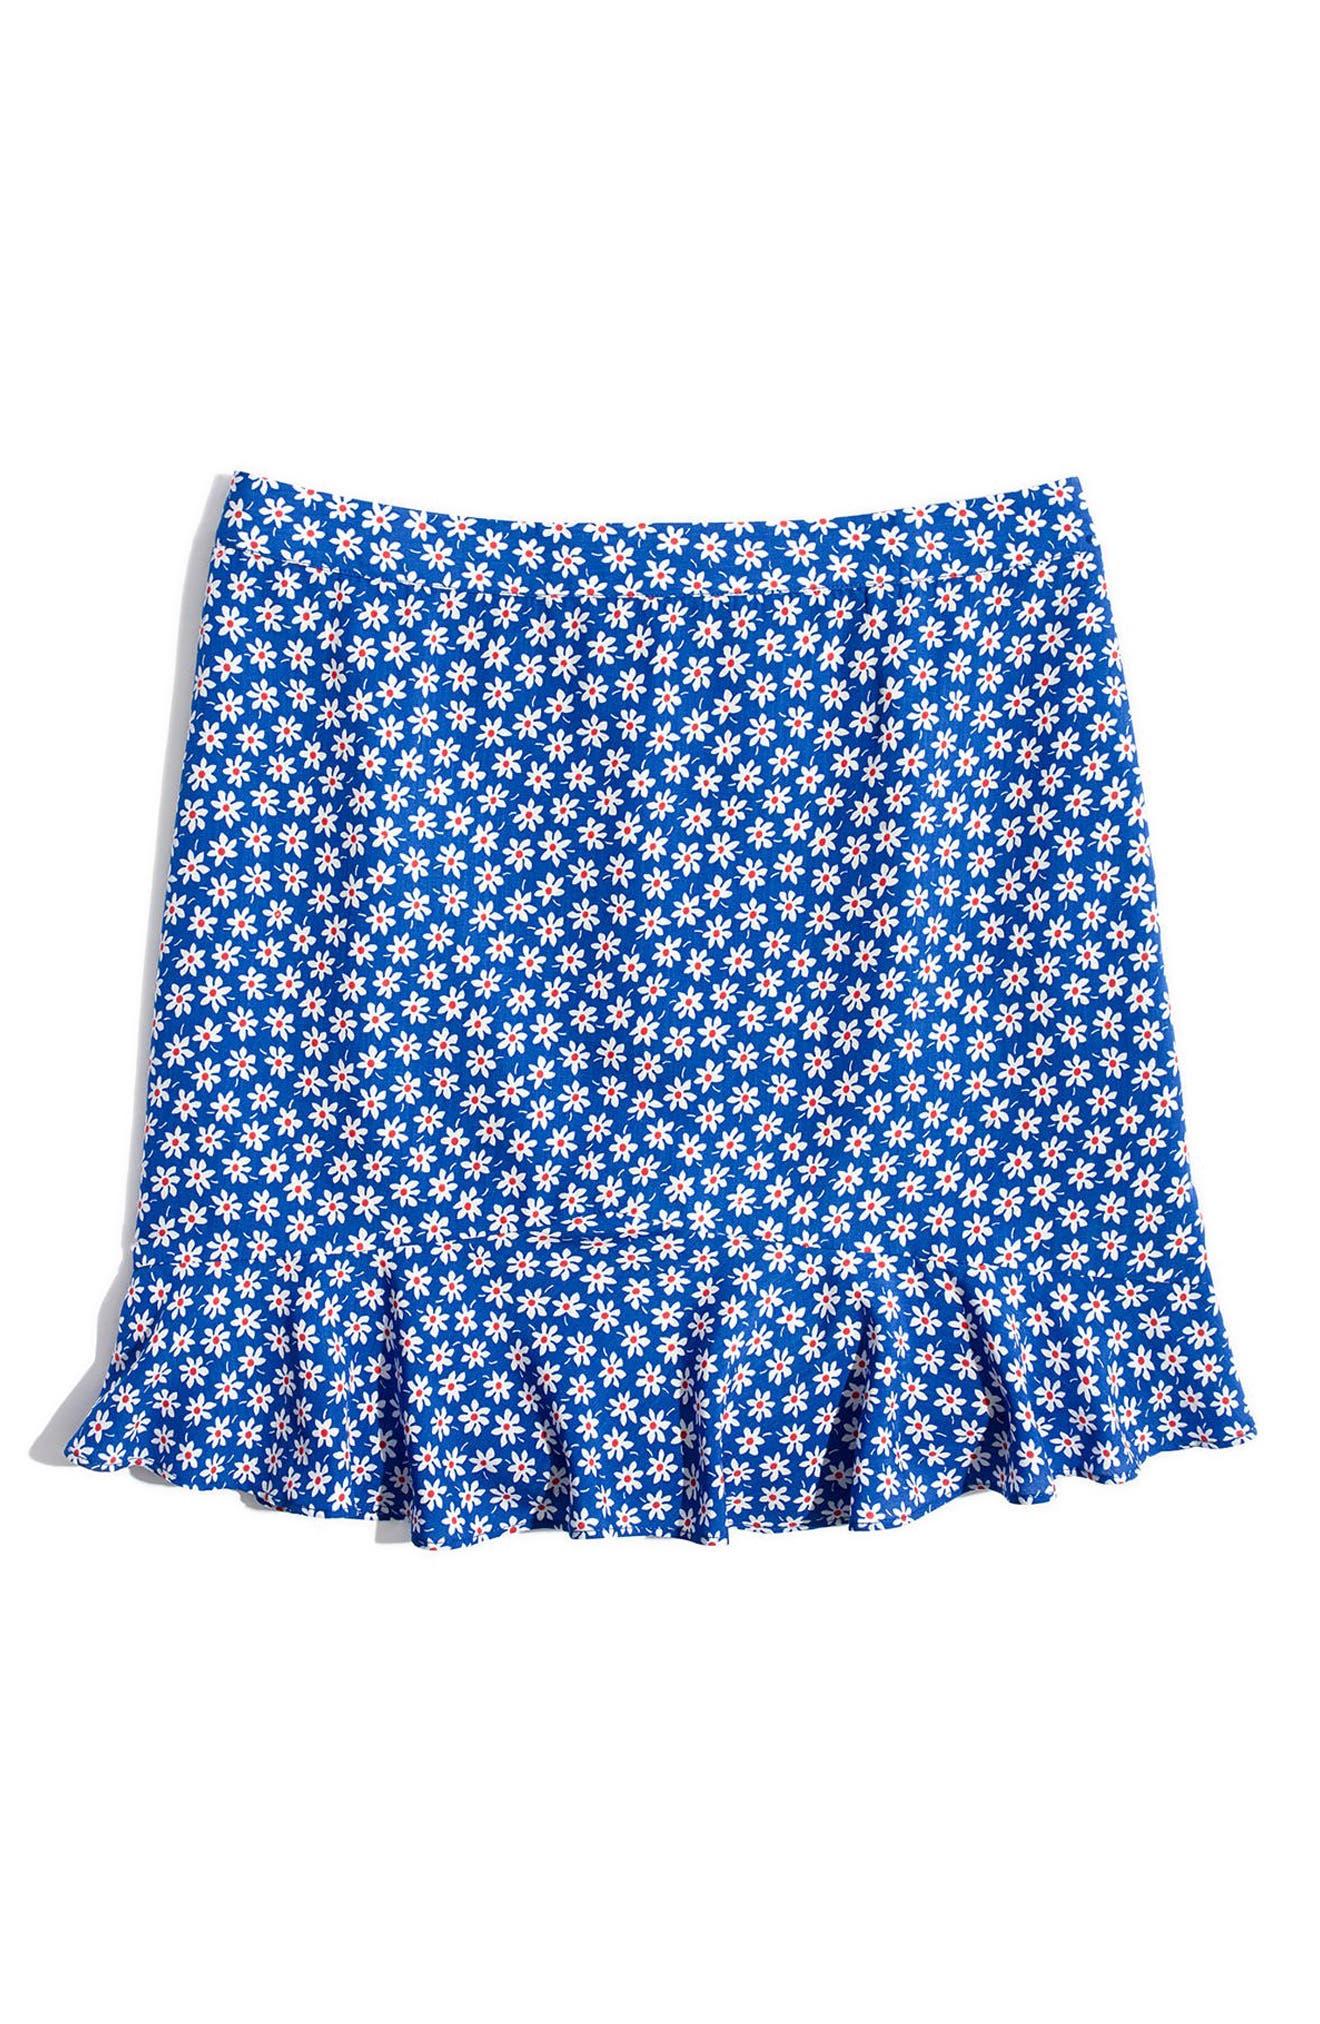 Daisy Print Ruffle Miniskirt,                             Alternate thumbnail 4, color,                             BRILLIANT ROYAL